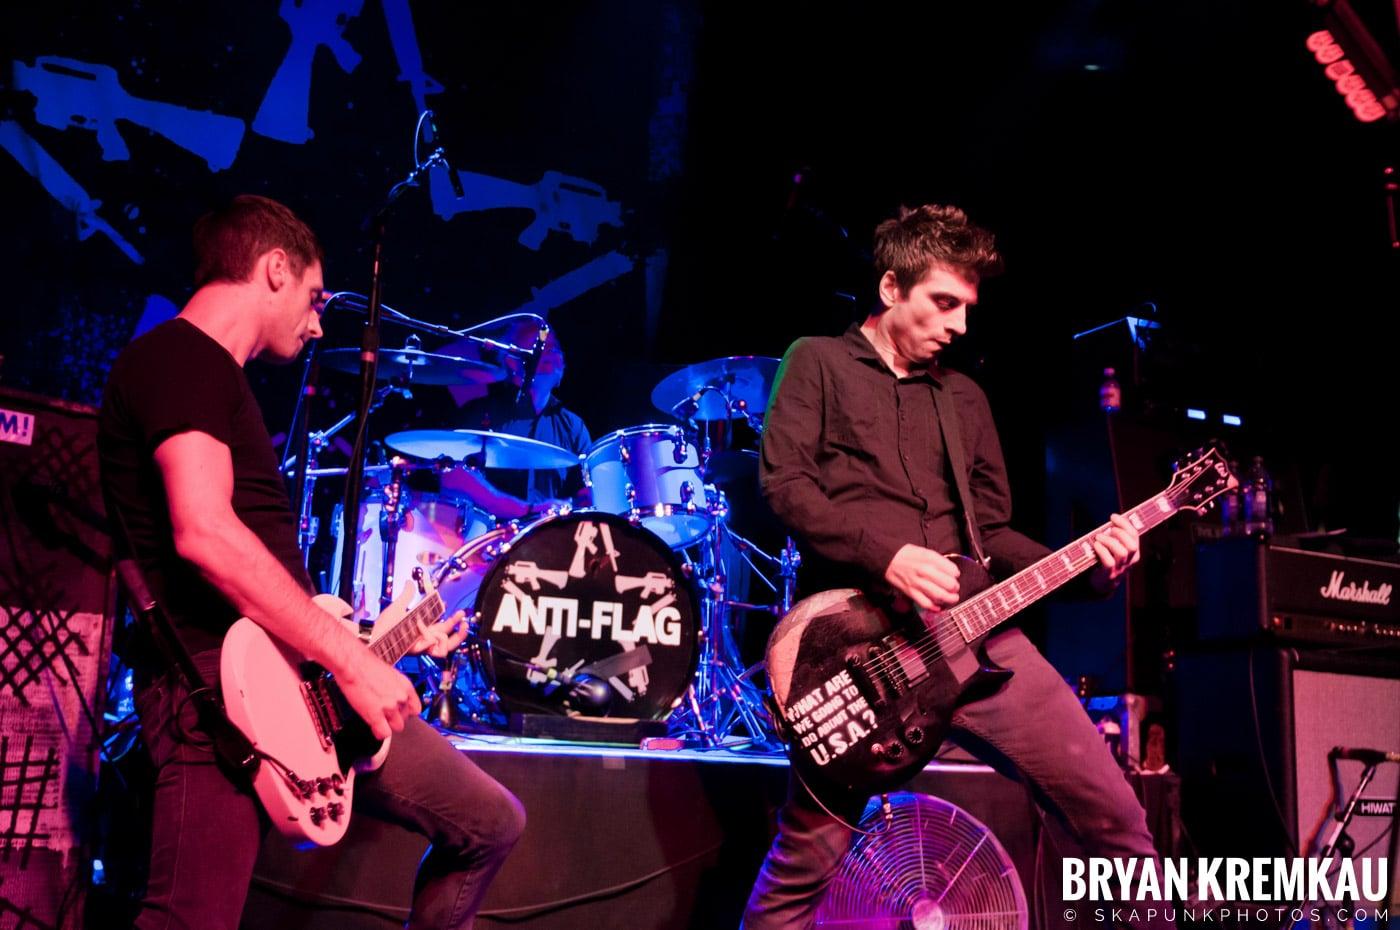 Anti-Flag @ Irving Plaza, NYC - 10.8.11 (23)